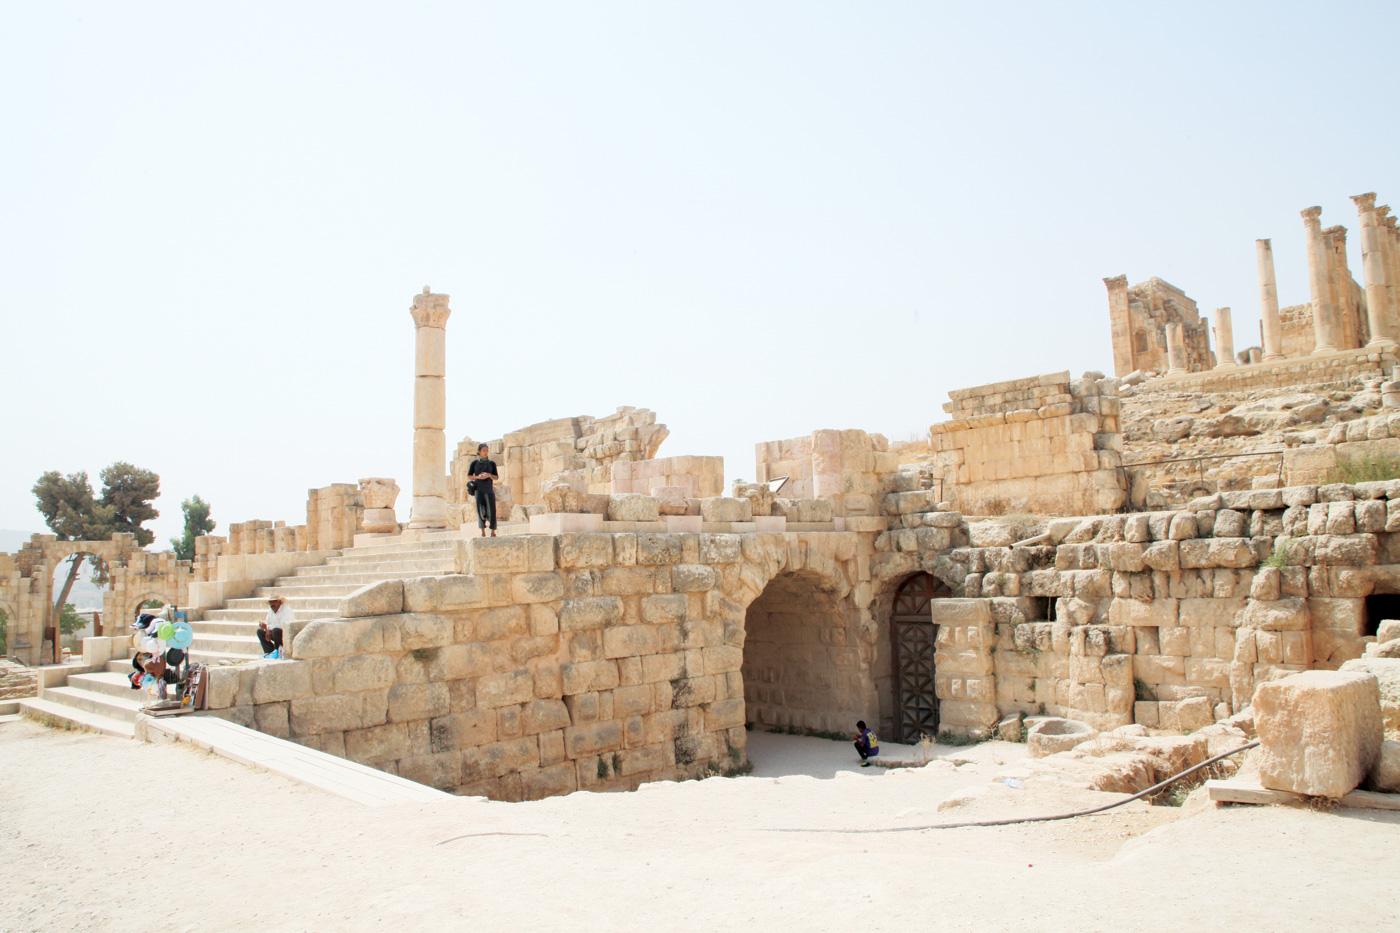 Part of the splendid ruins in Jerash